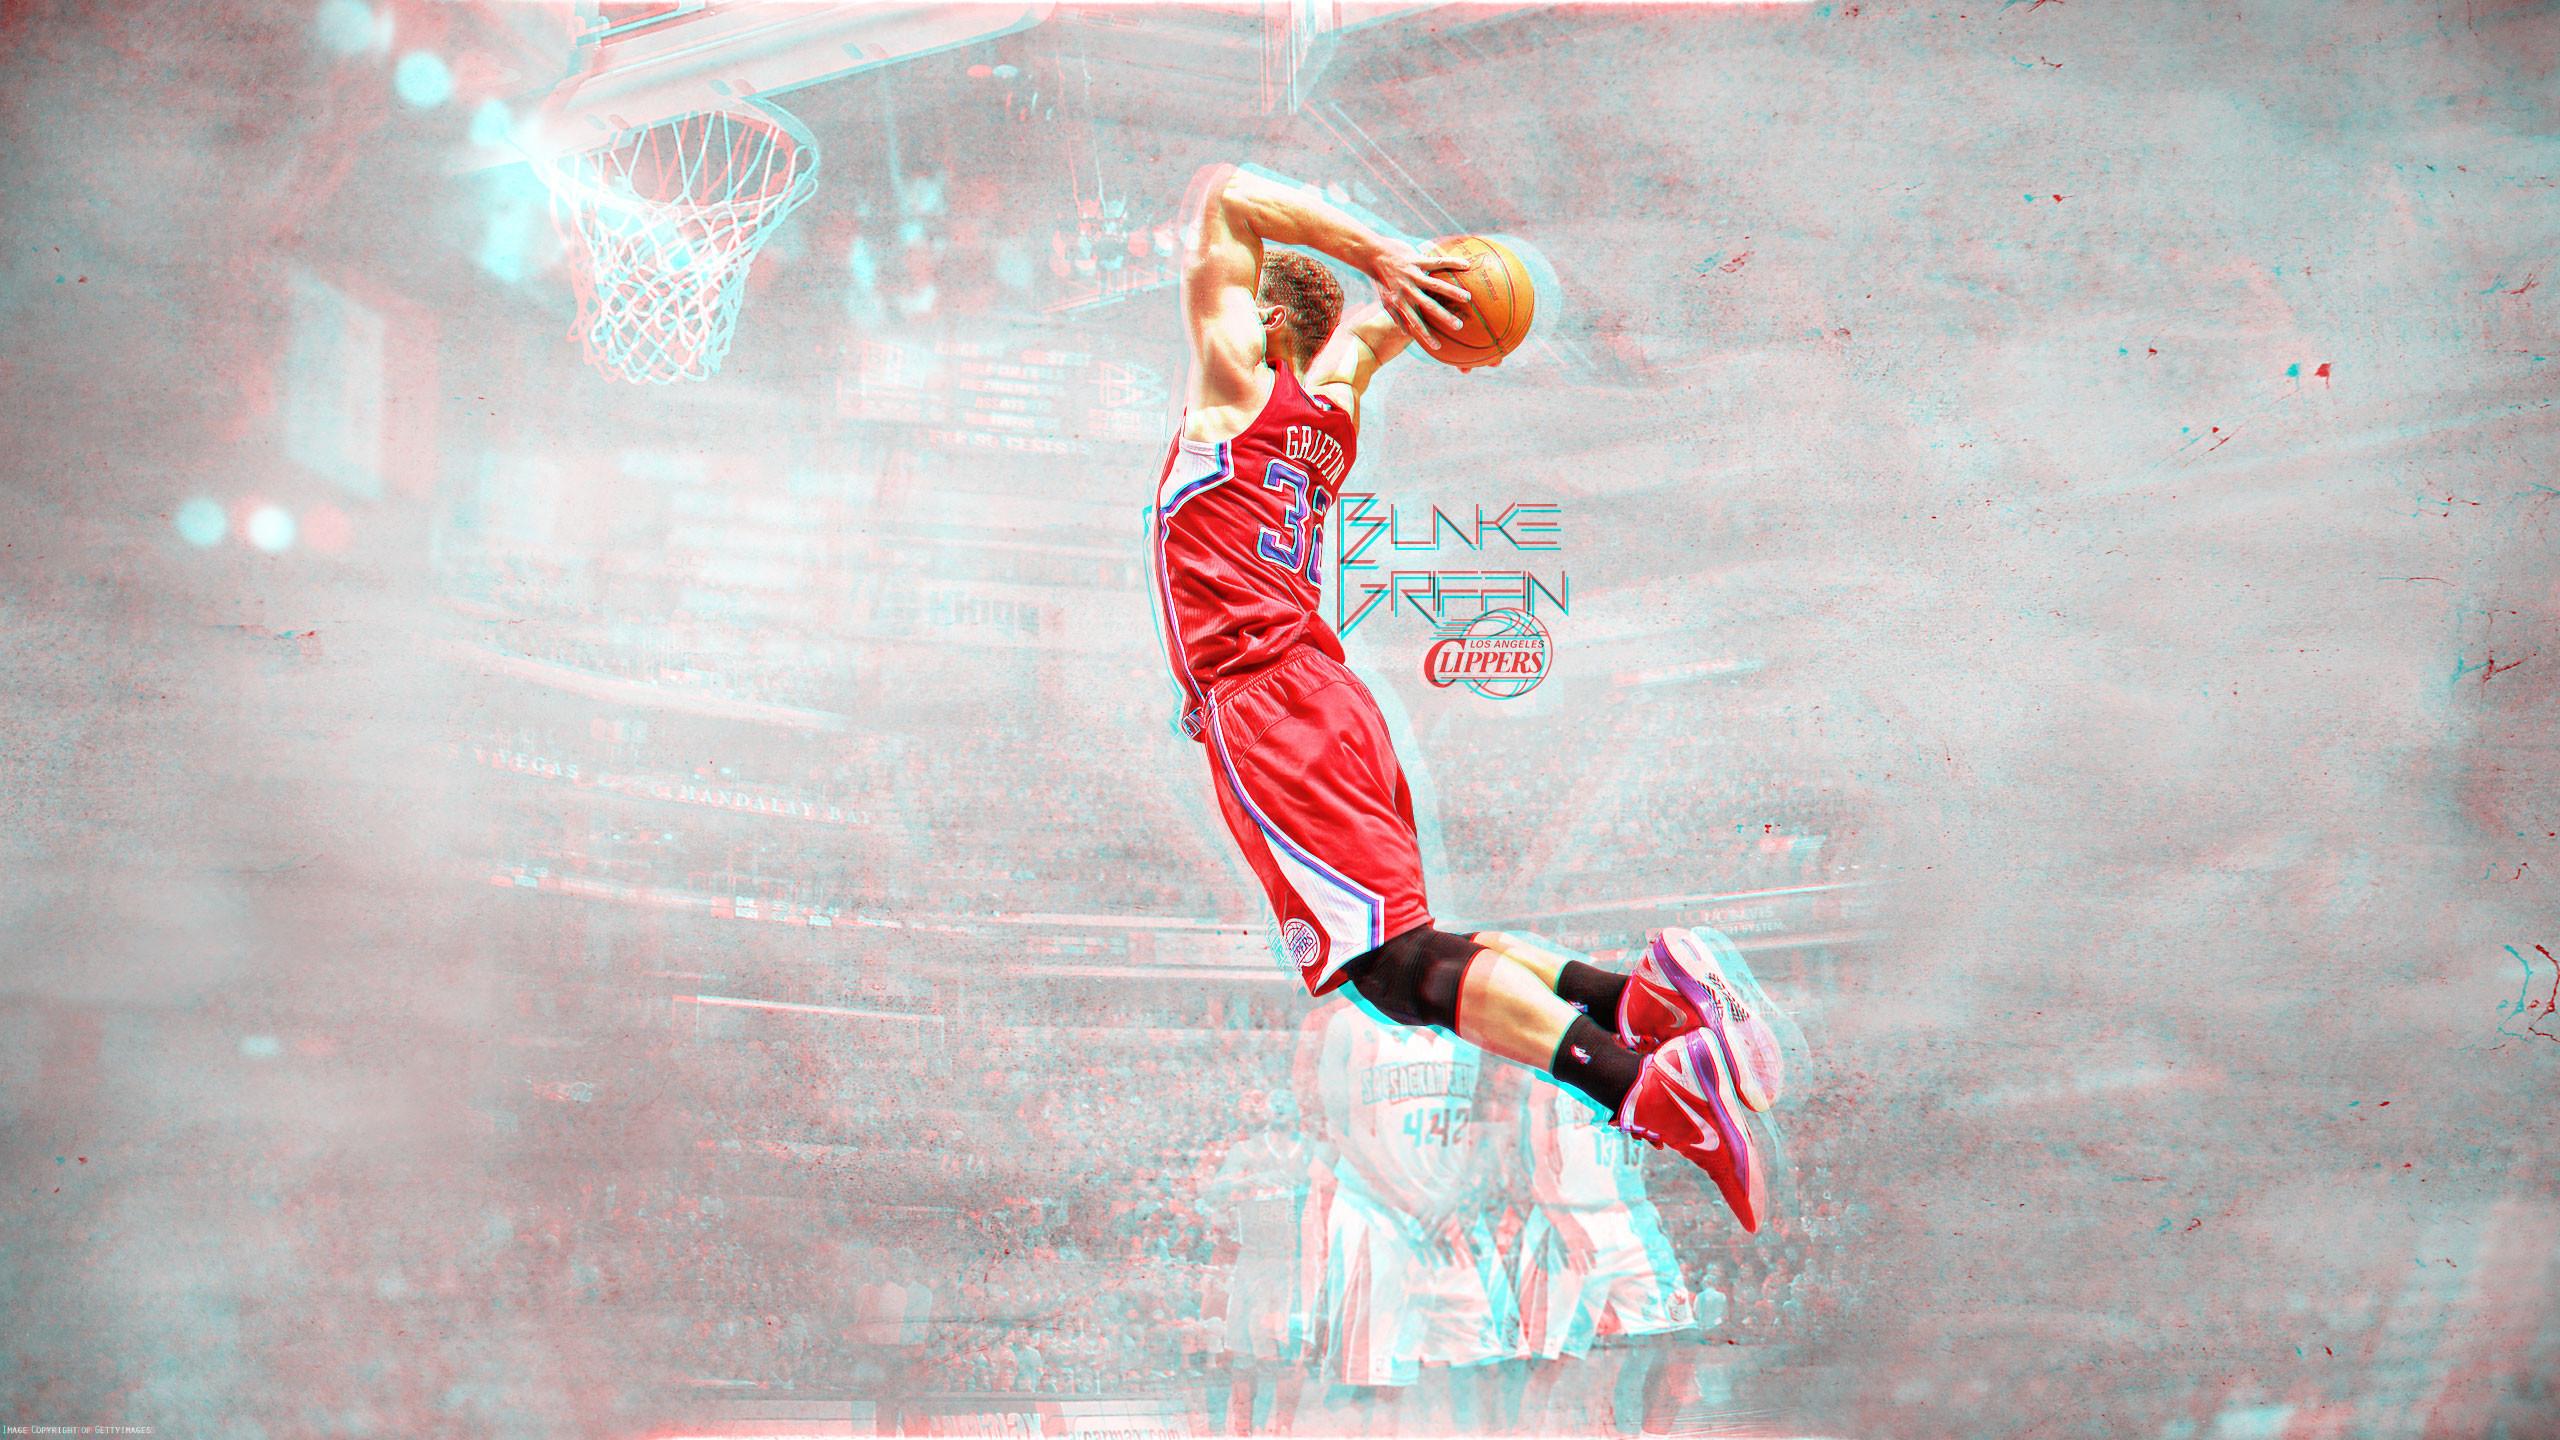 Blake Griffin Dunk HD Wallpaper | Wallpapers | Pinterest | Blake griffin  and Hd wallpaper